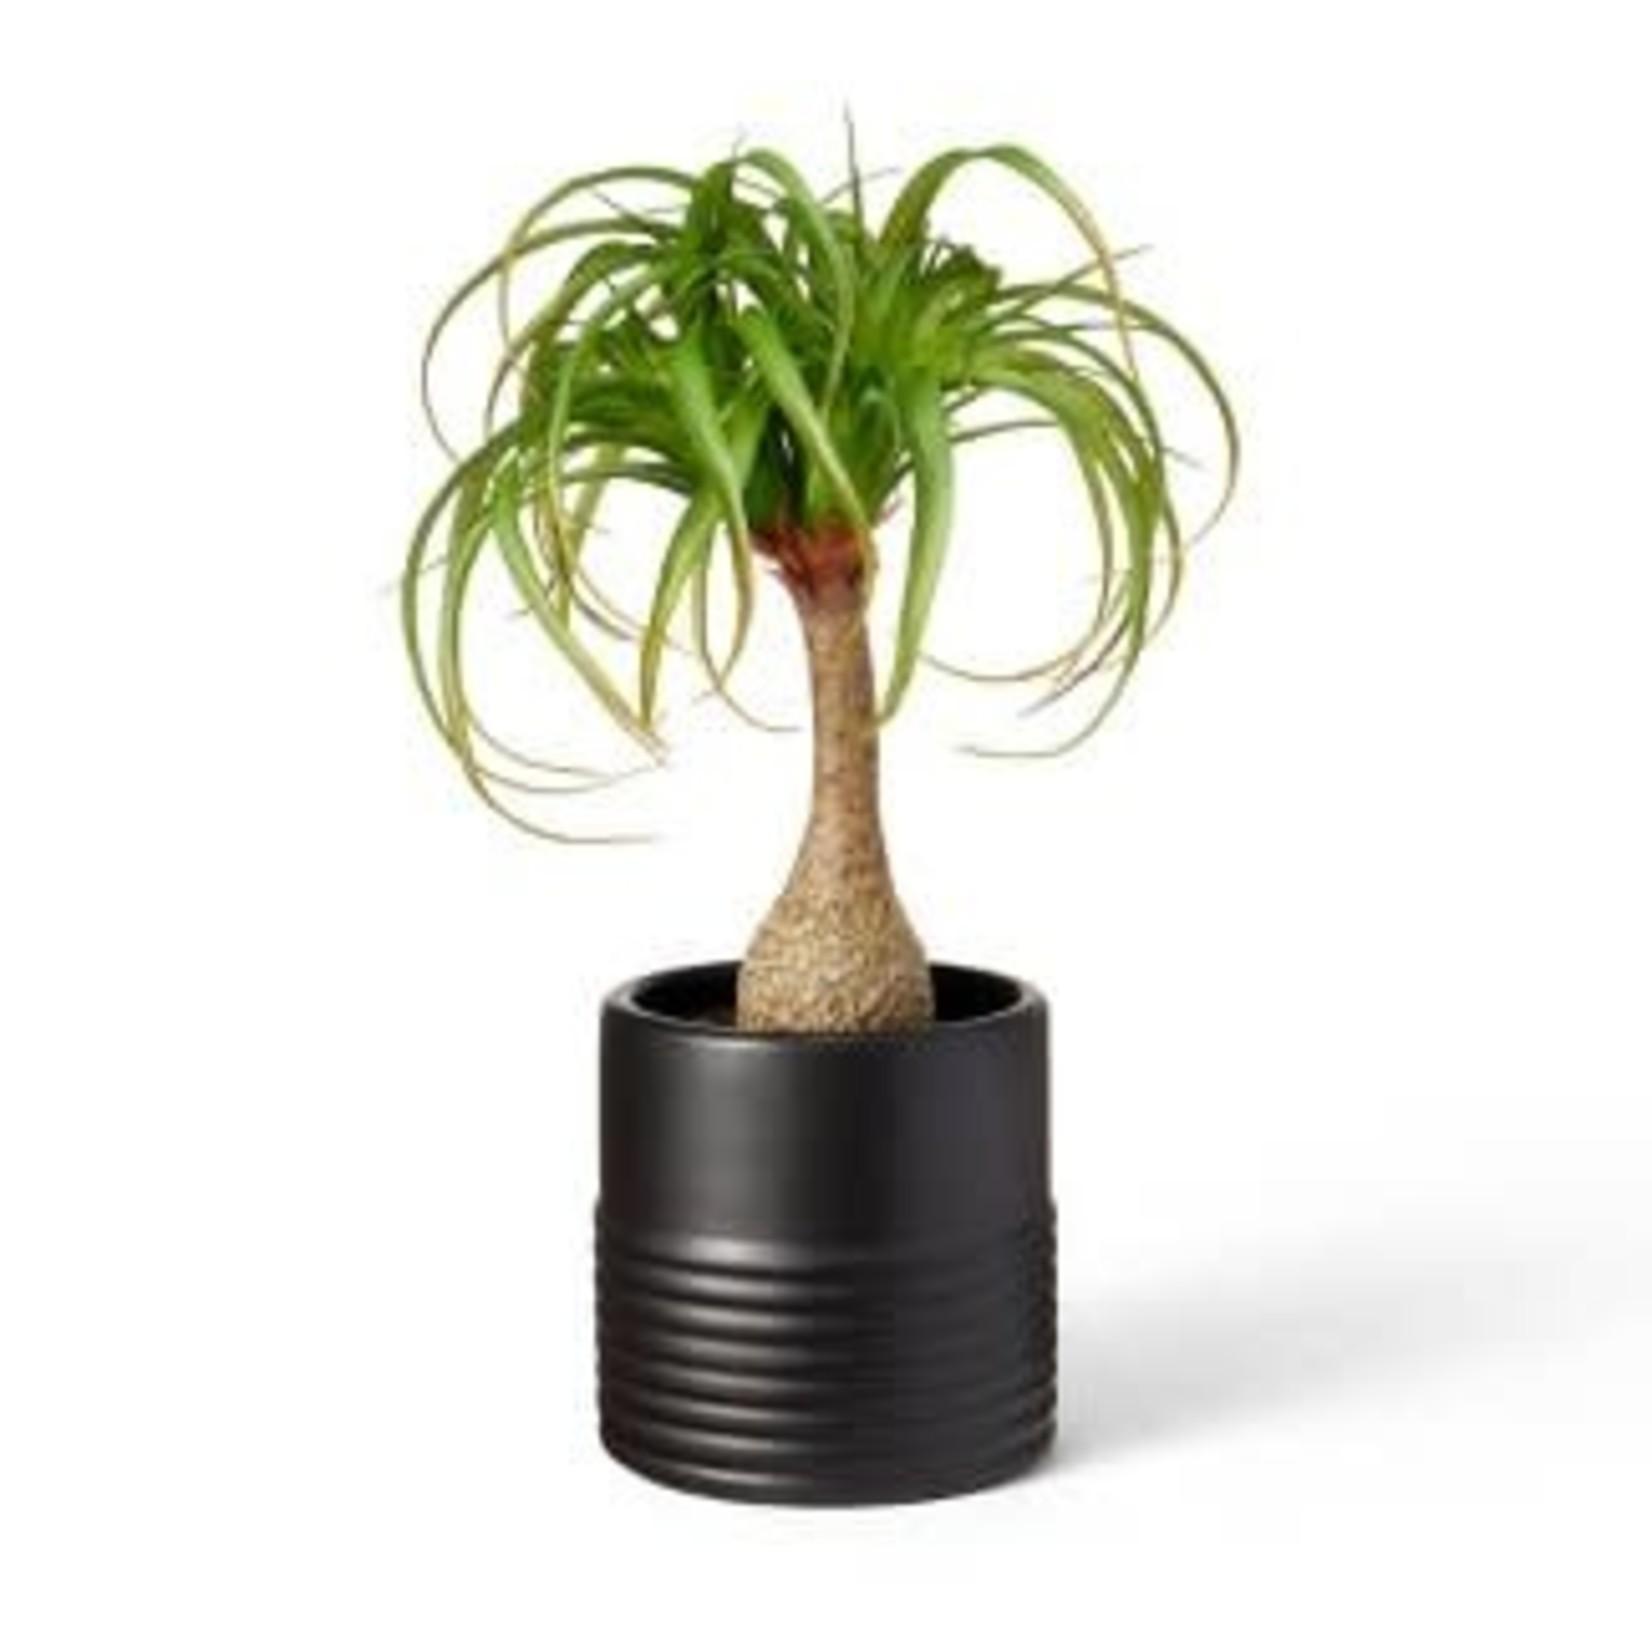 "18"" x 12"" Faux Ponytail Palm Plant in Ribbed Ceramic Pot Black"